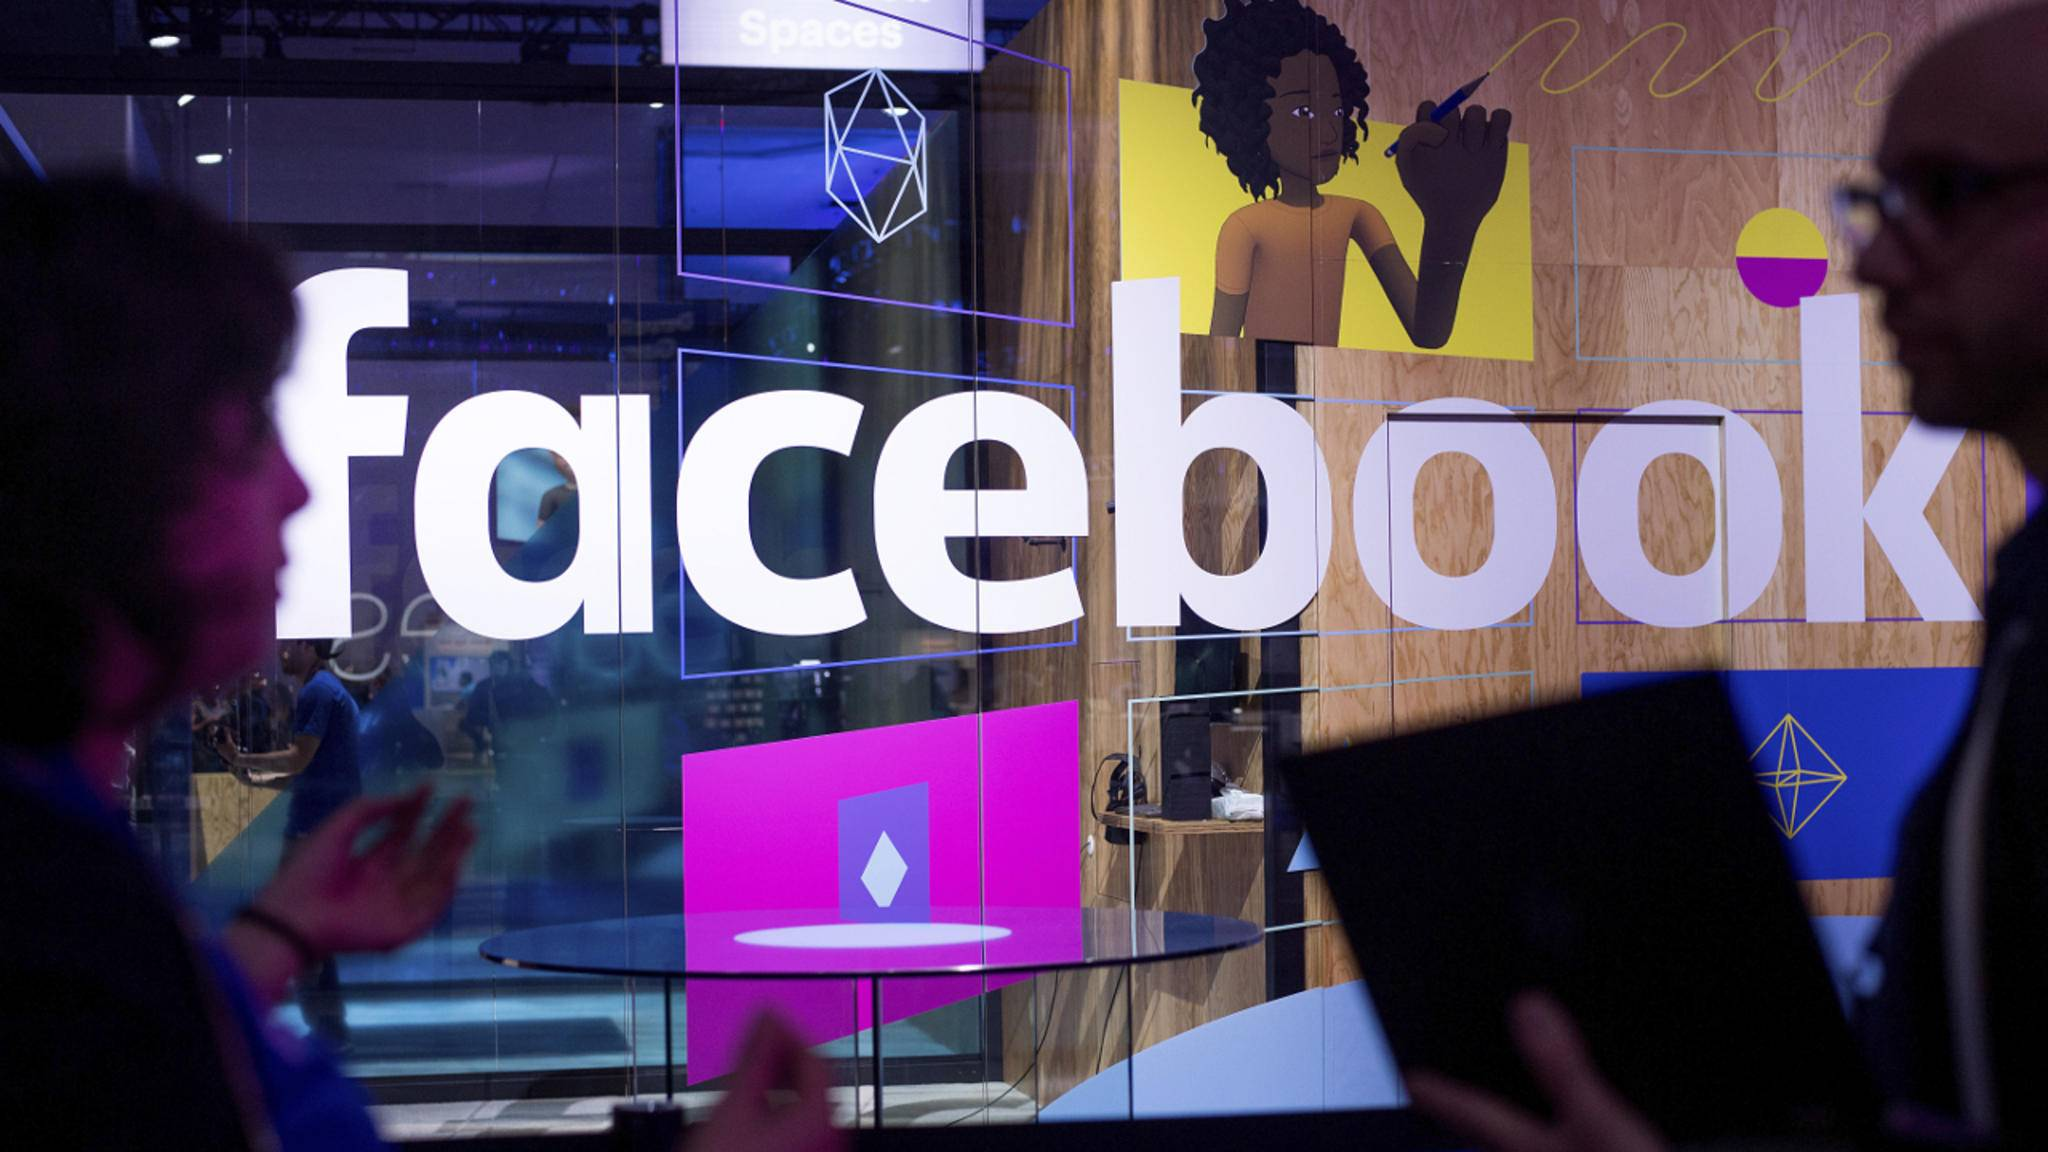 Facebook steckt im größten Datenskandal seiner Geschichte.